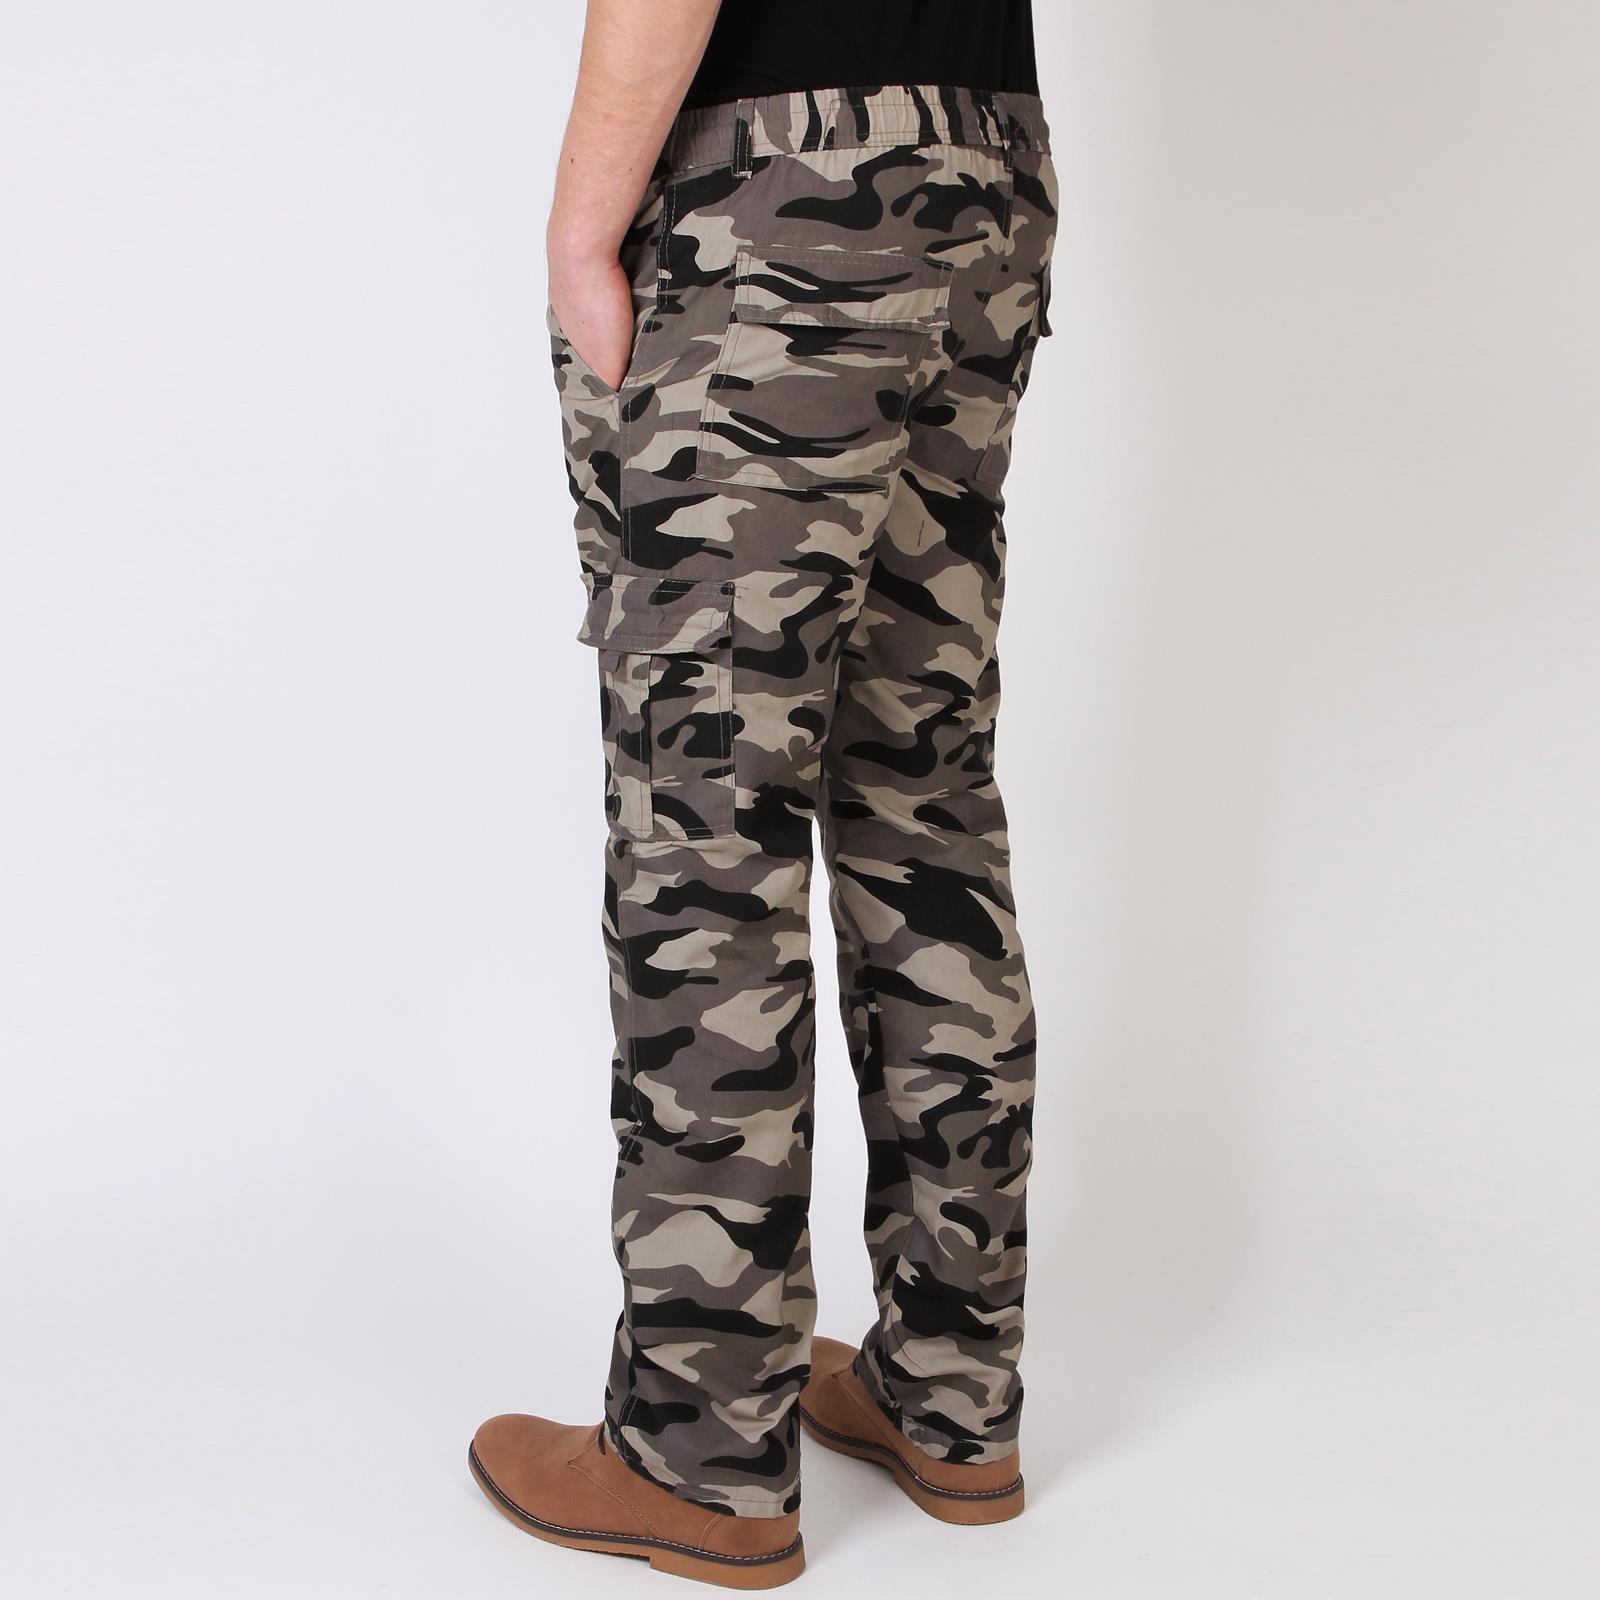 Homme-Pantalon-Imprime-Camouflage-Cargo-Multi-Poches-Style-Militaire miniature 10